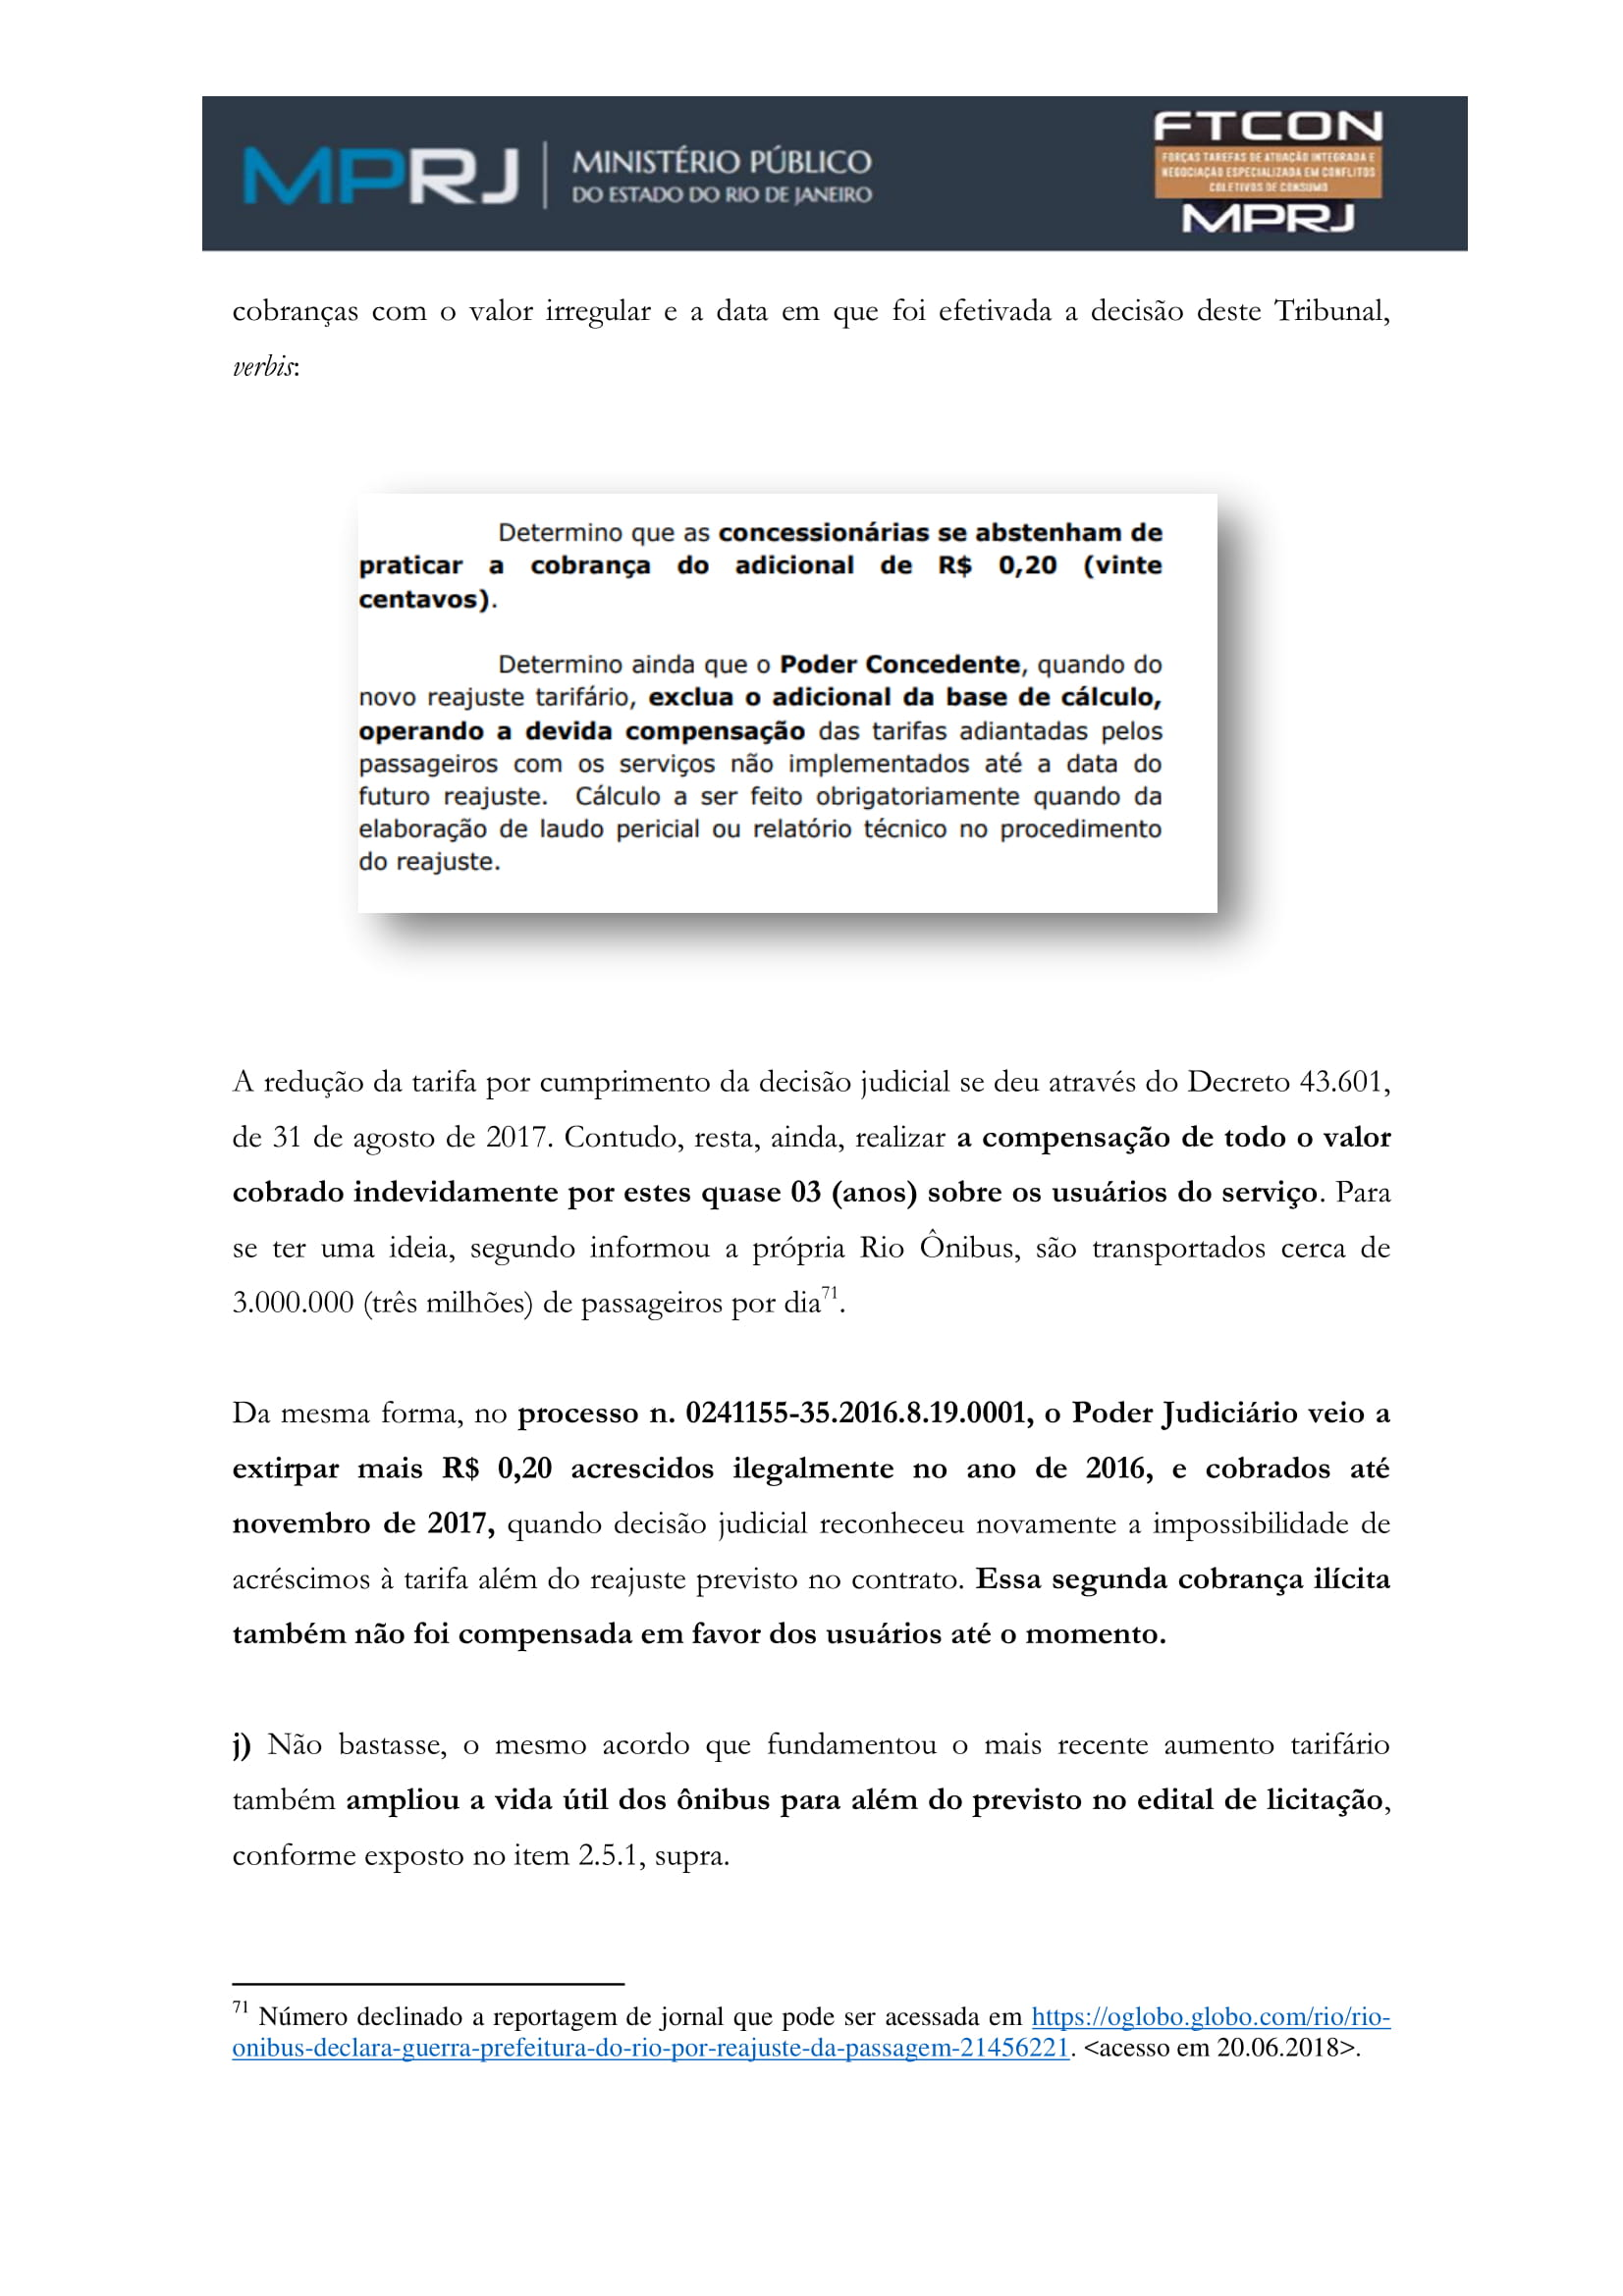 acp_caducidade_onibus_dr_rt-081